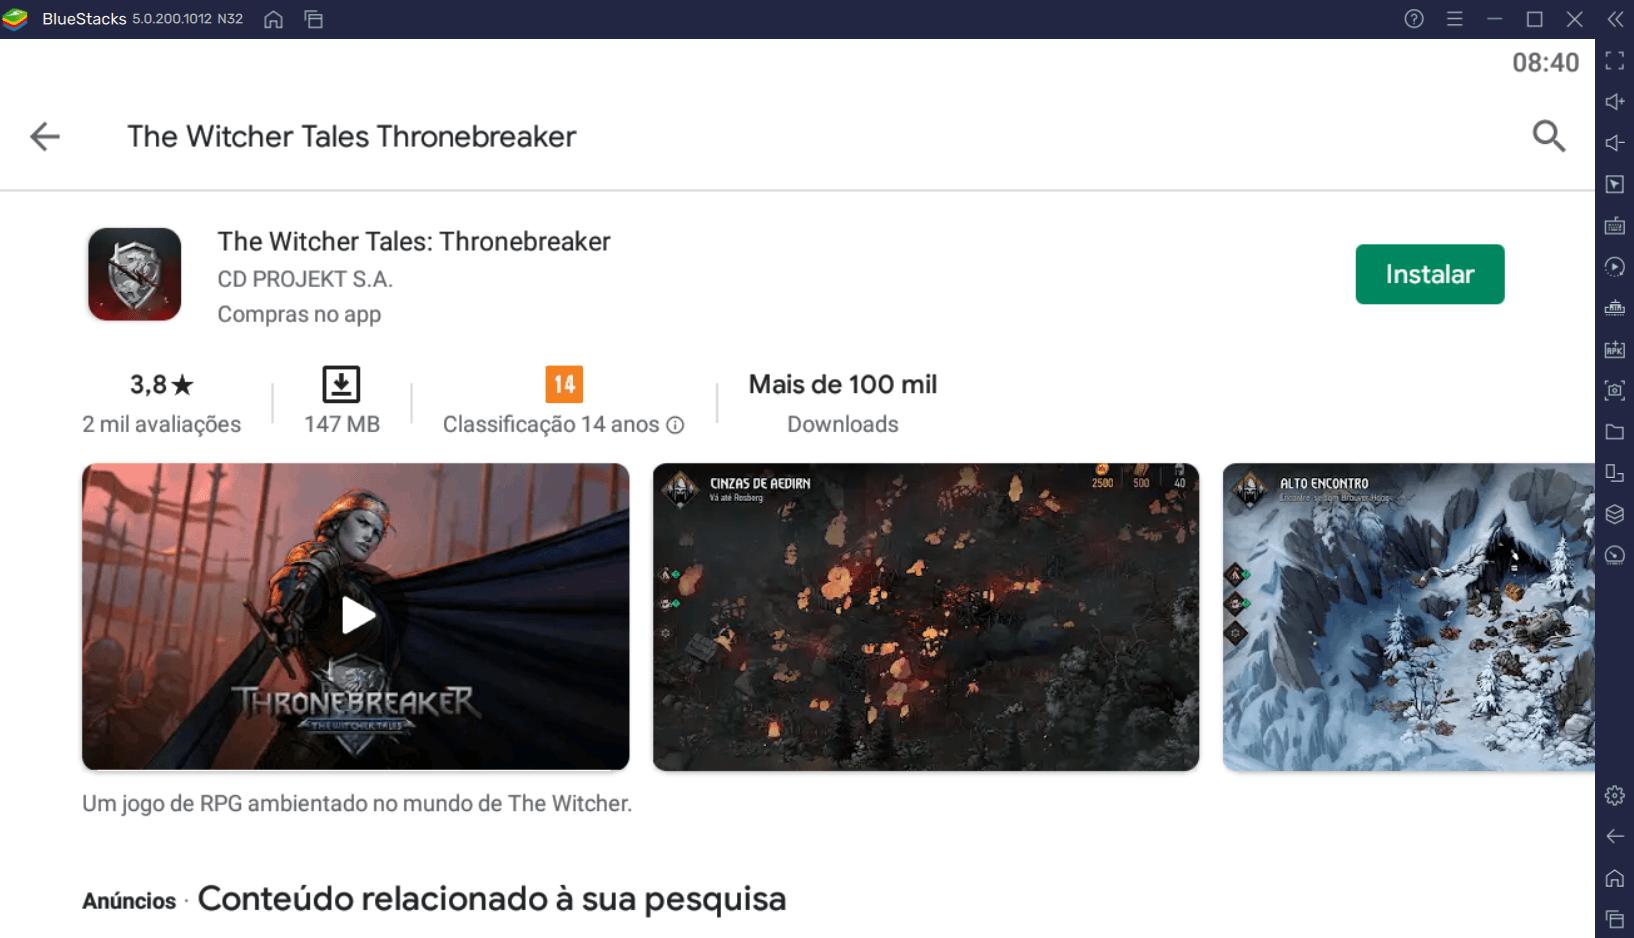 Como instalar The Witcher Tales: Thronebreaker de graça no PC com BlueStacks